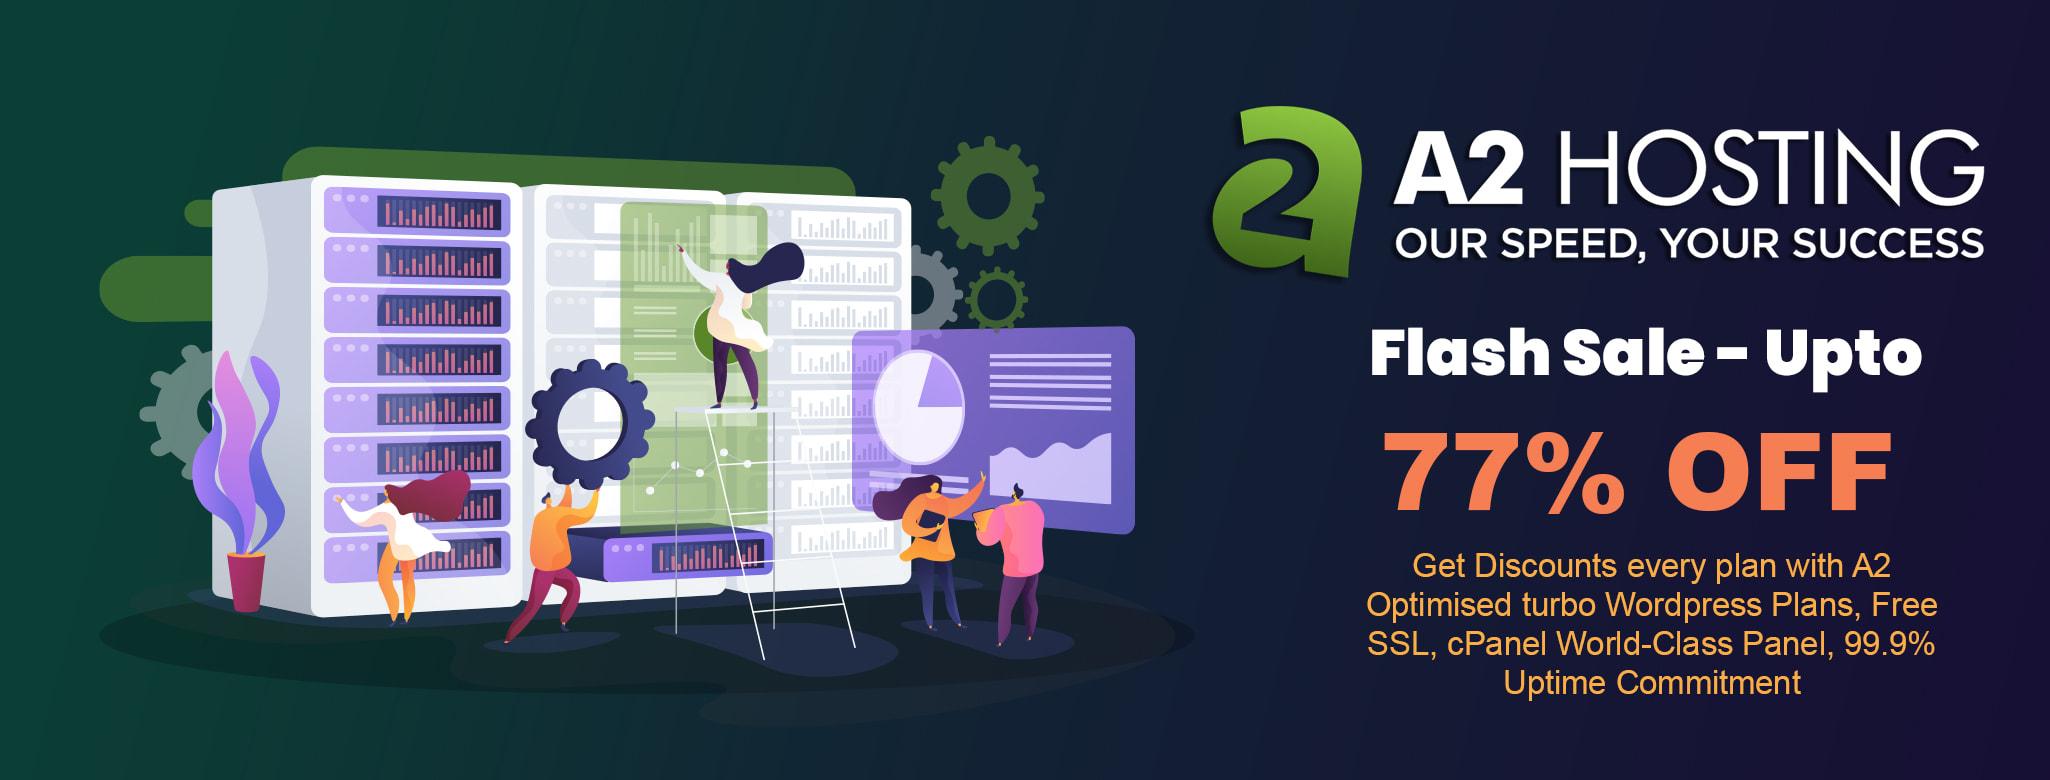 A2 Hosting-Black-Friday-Hosting-Deals